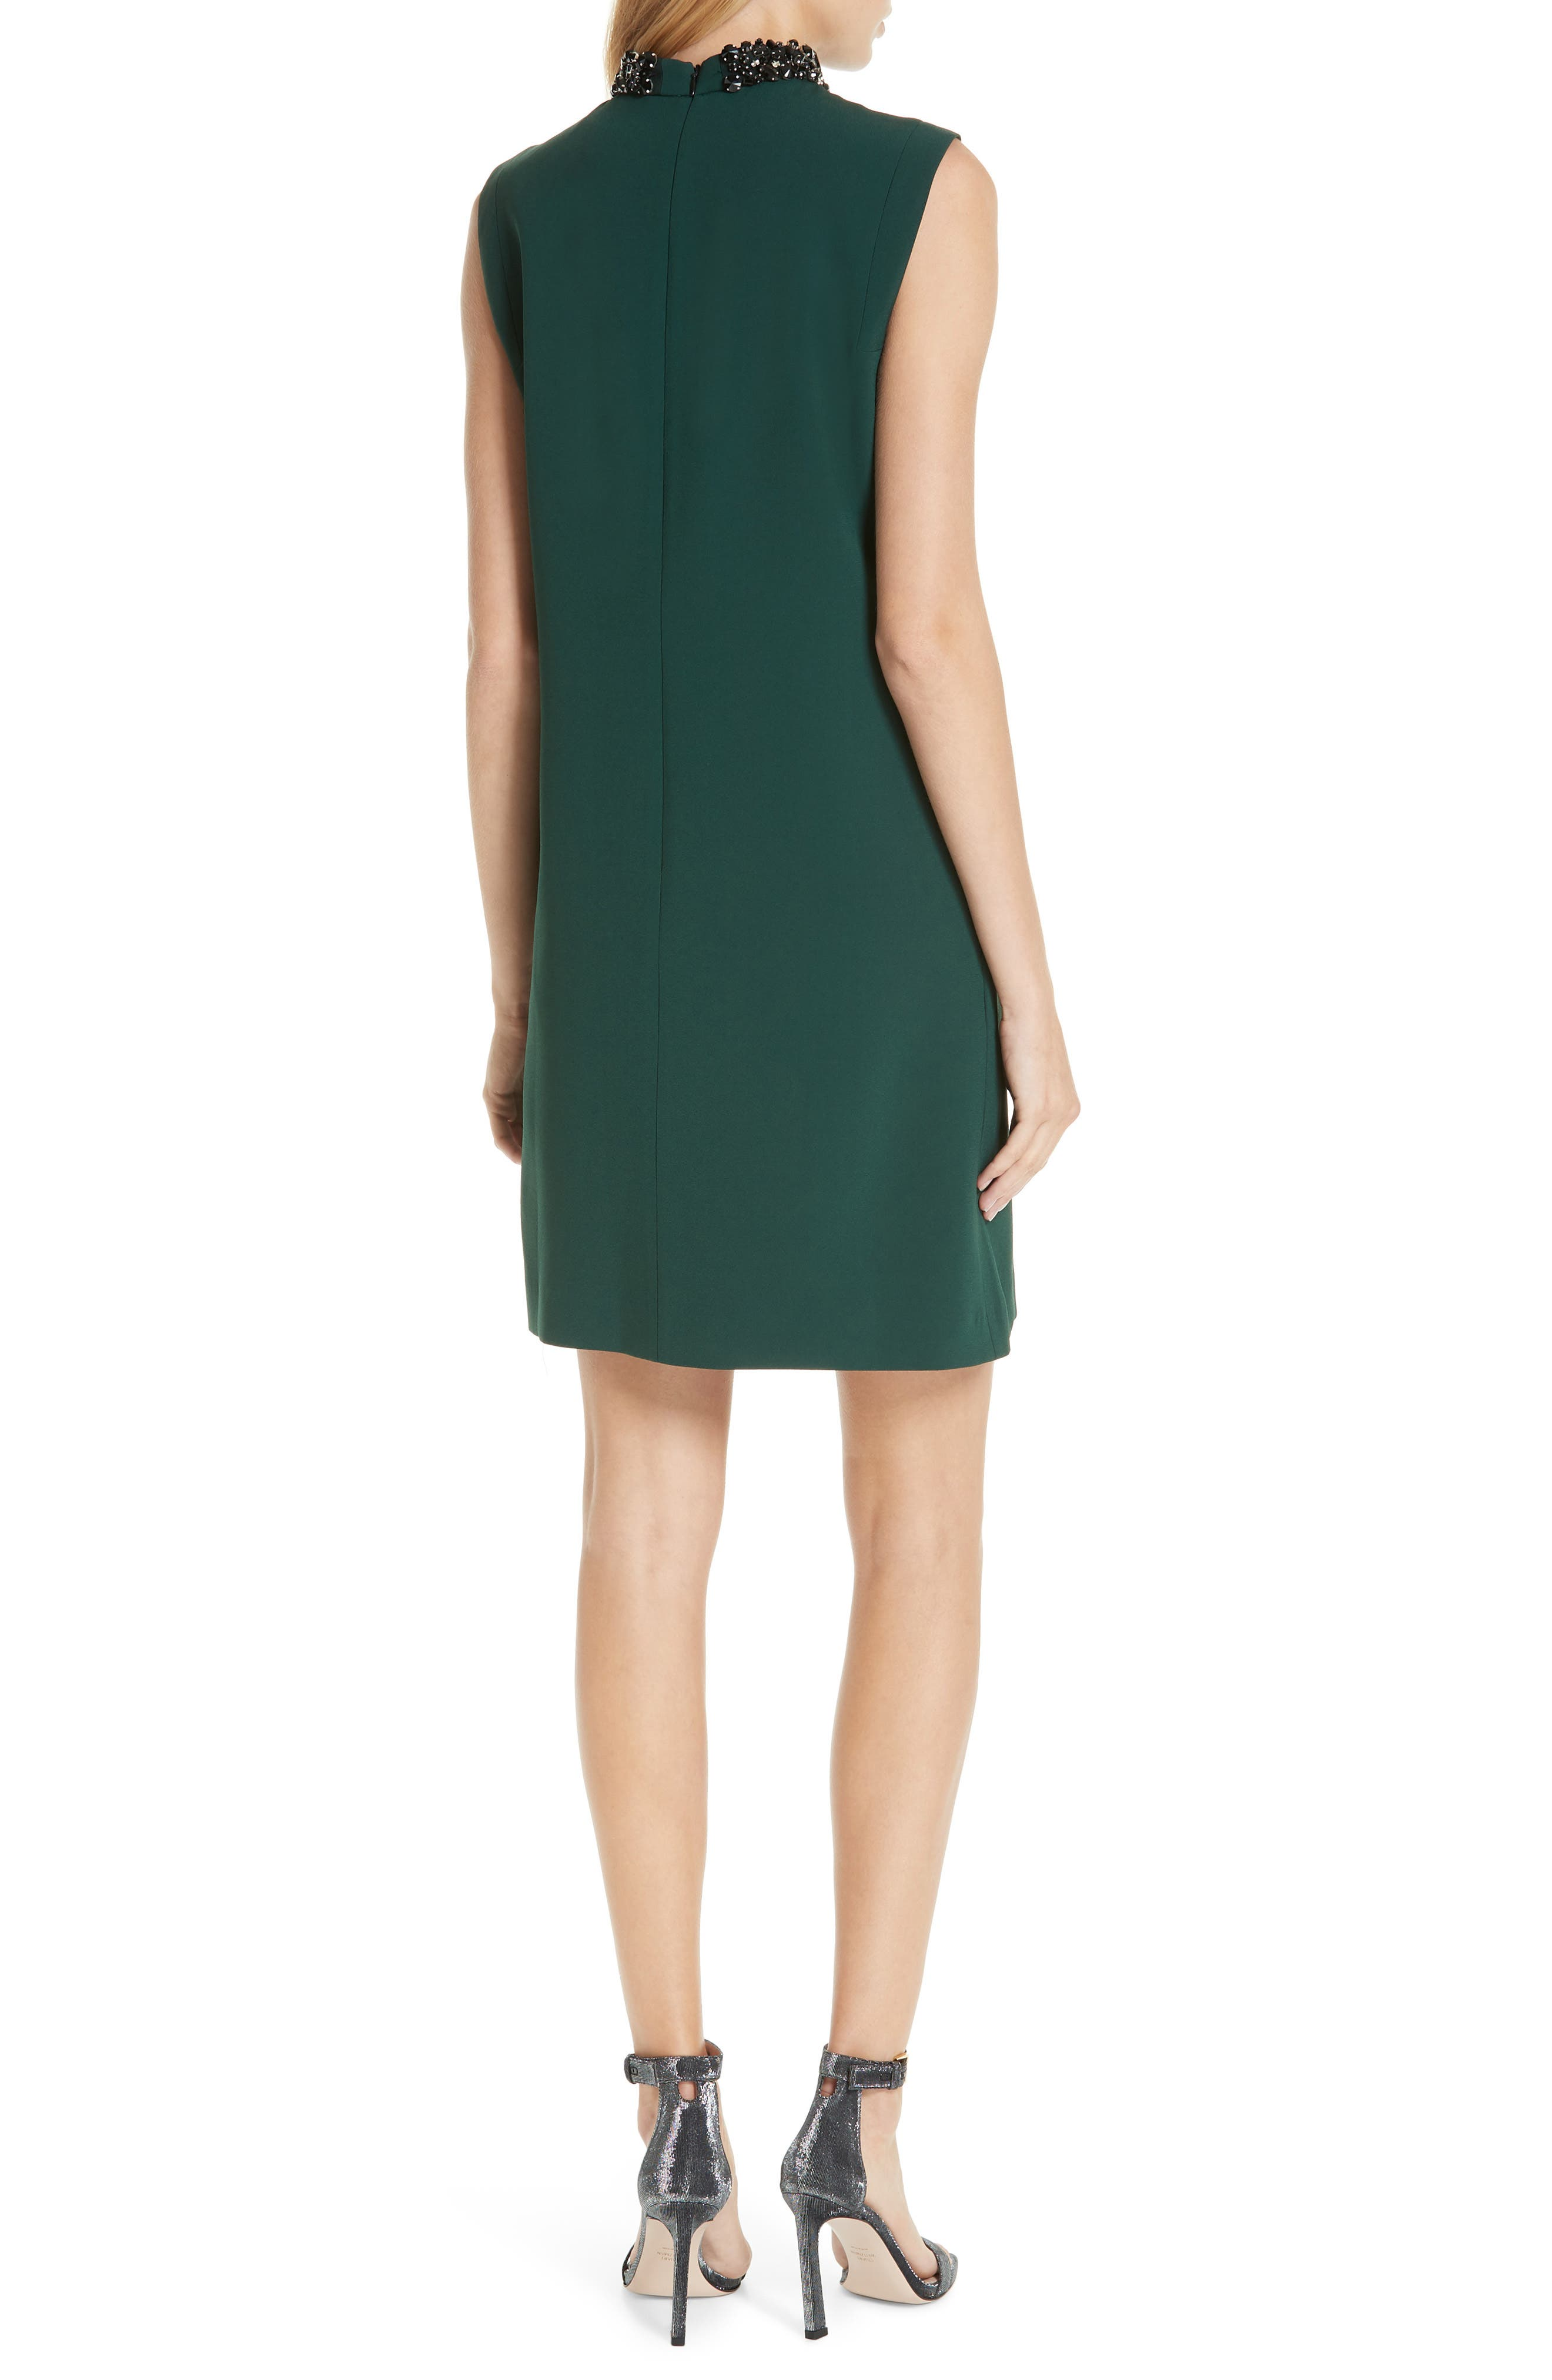 Verona Jewel Neck Dress,                             Alternate thumbnail 2, color,                             DK. GREEN